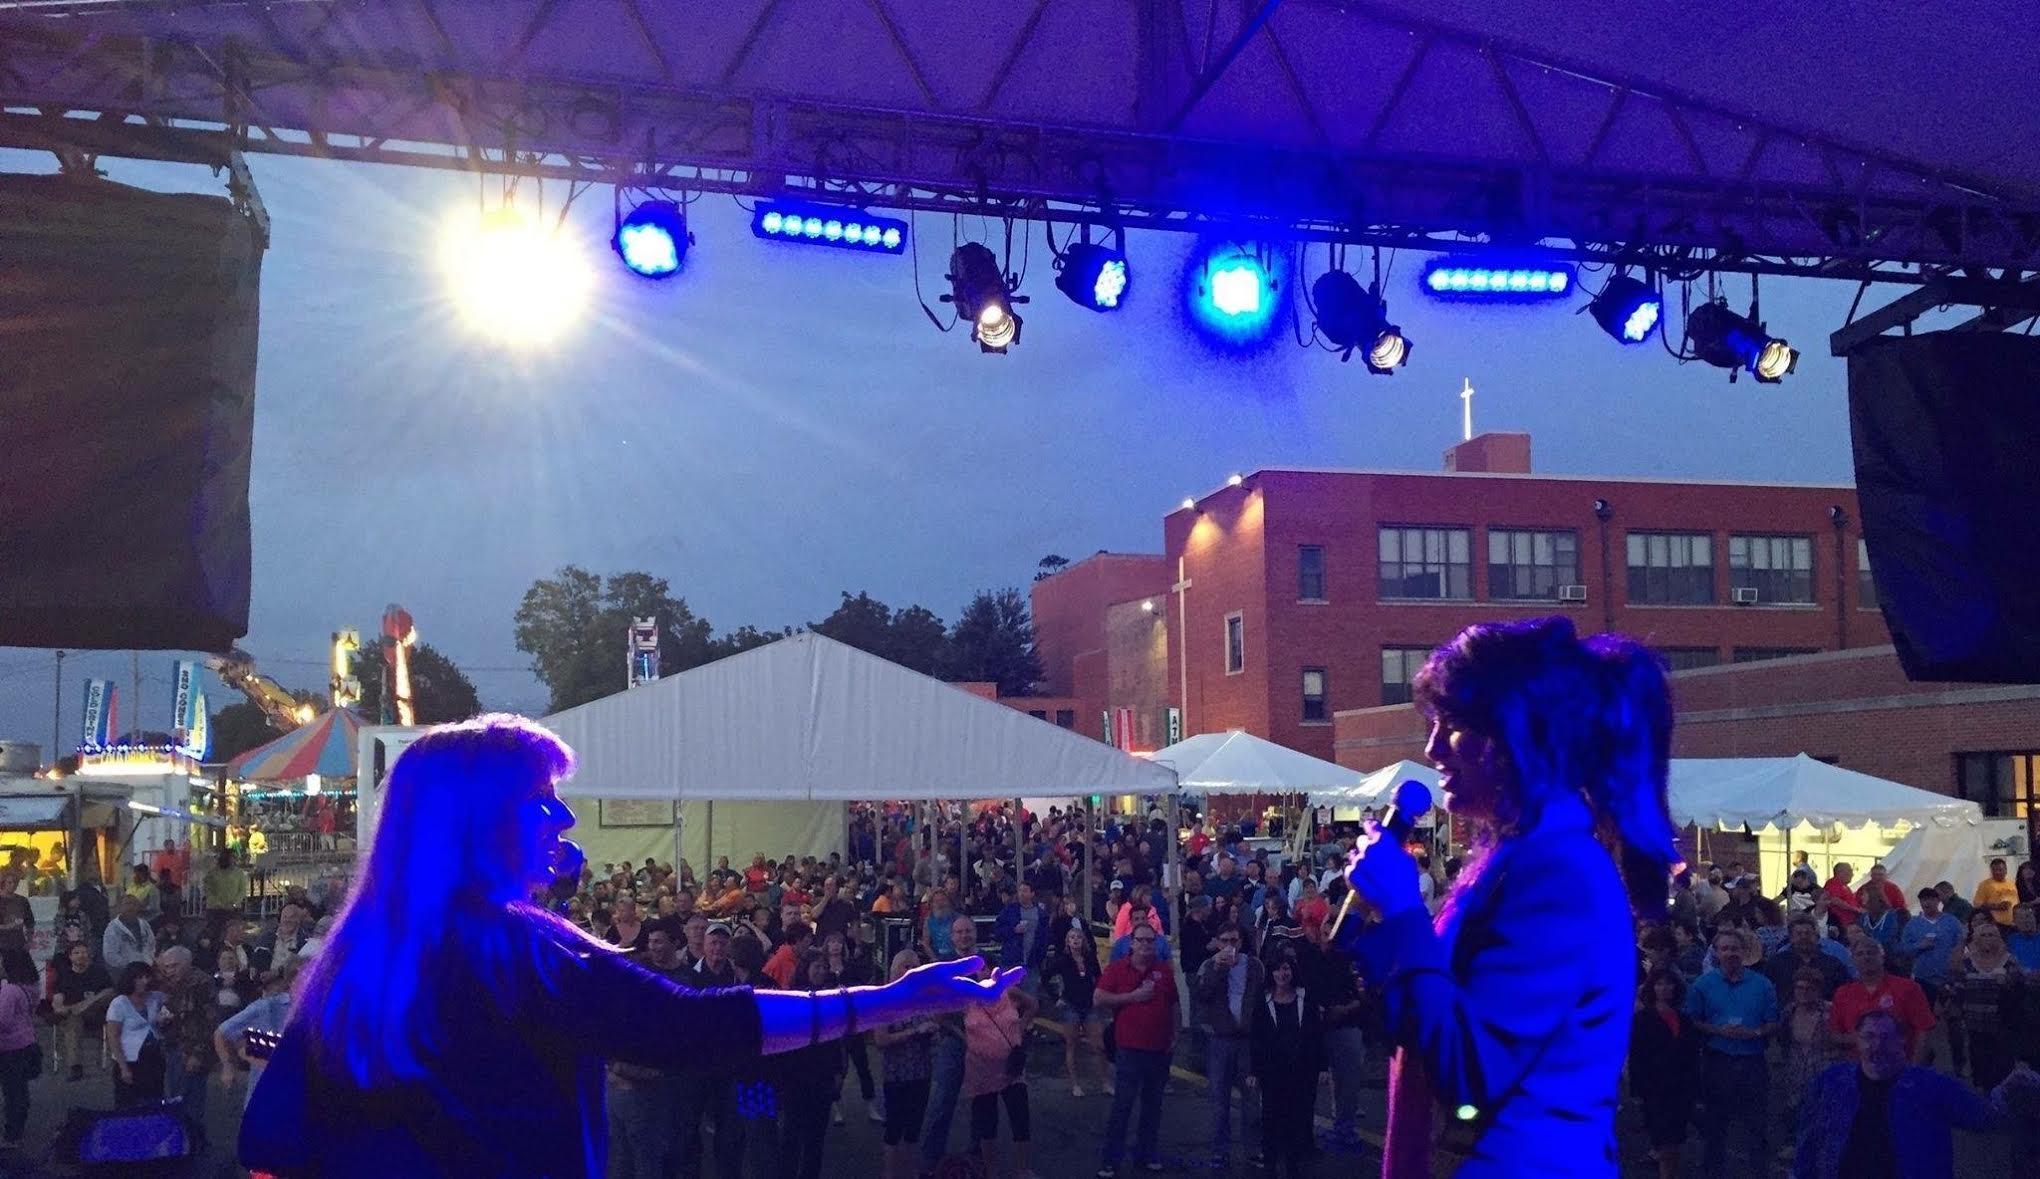 Crowd (Lombard).jpg